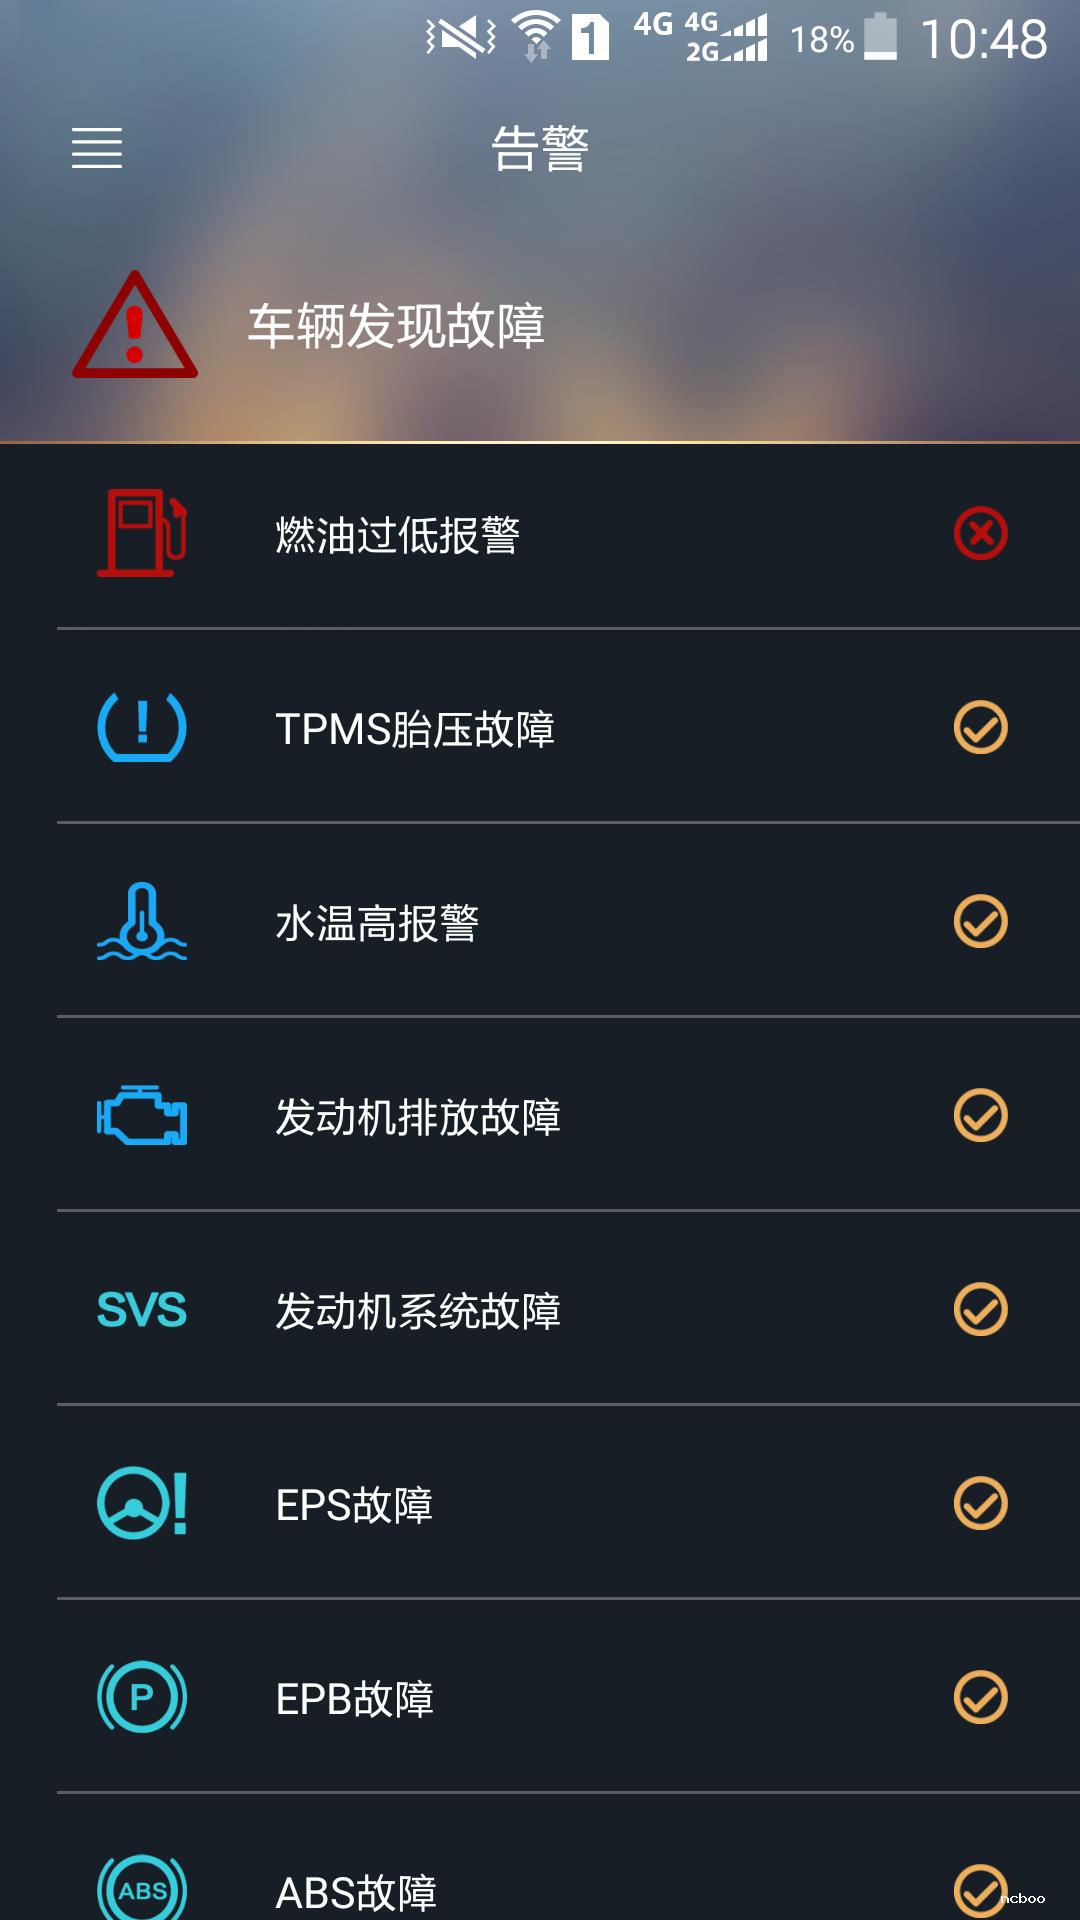 吉利G-Netlink,博越app下载